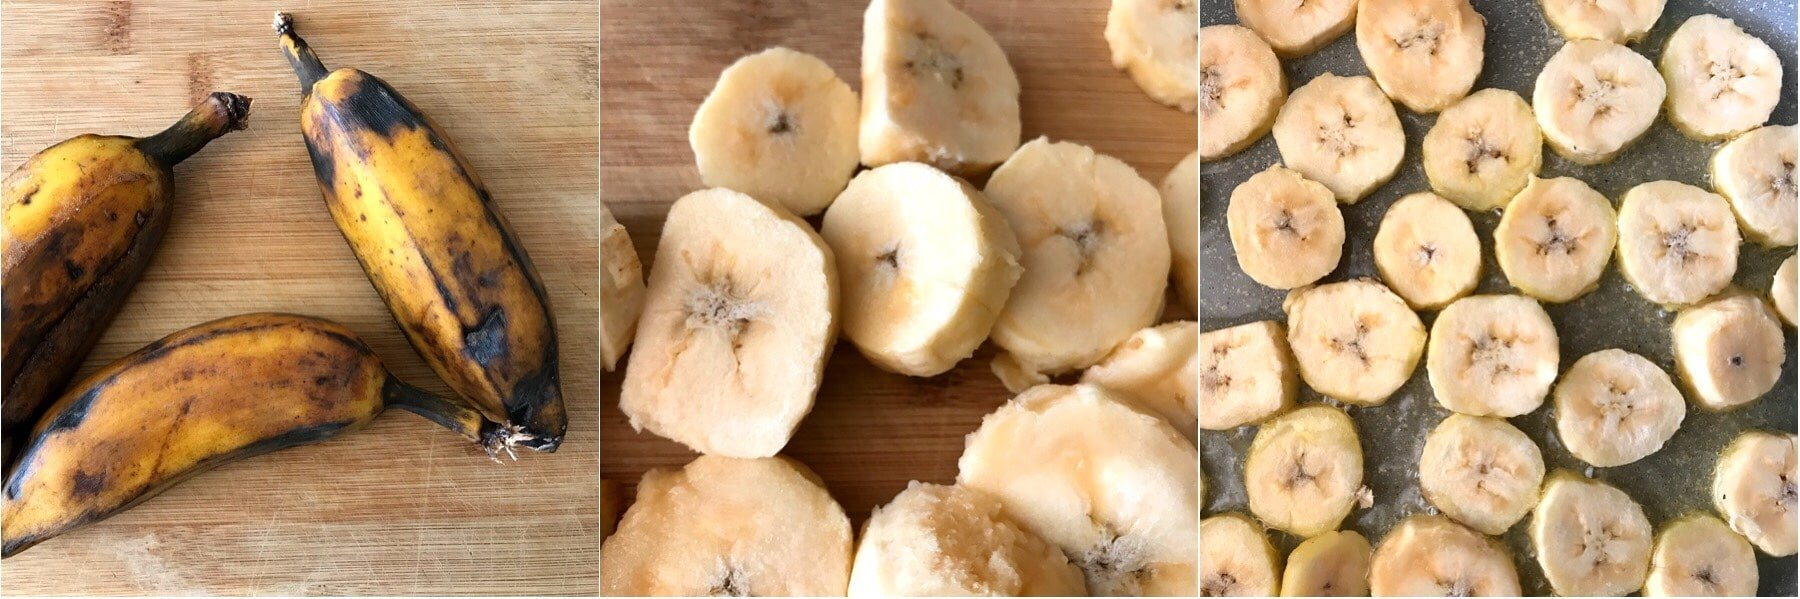 sliced ripe plantain